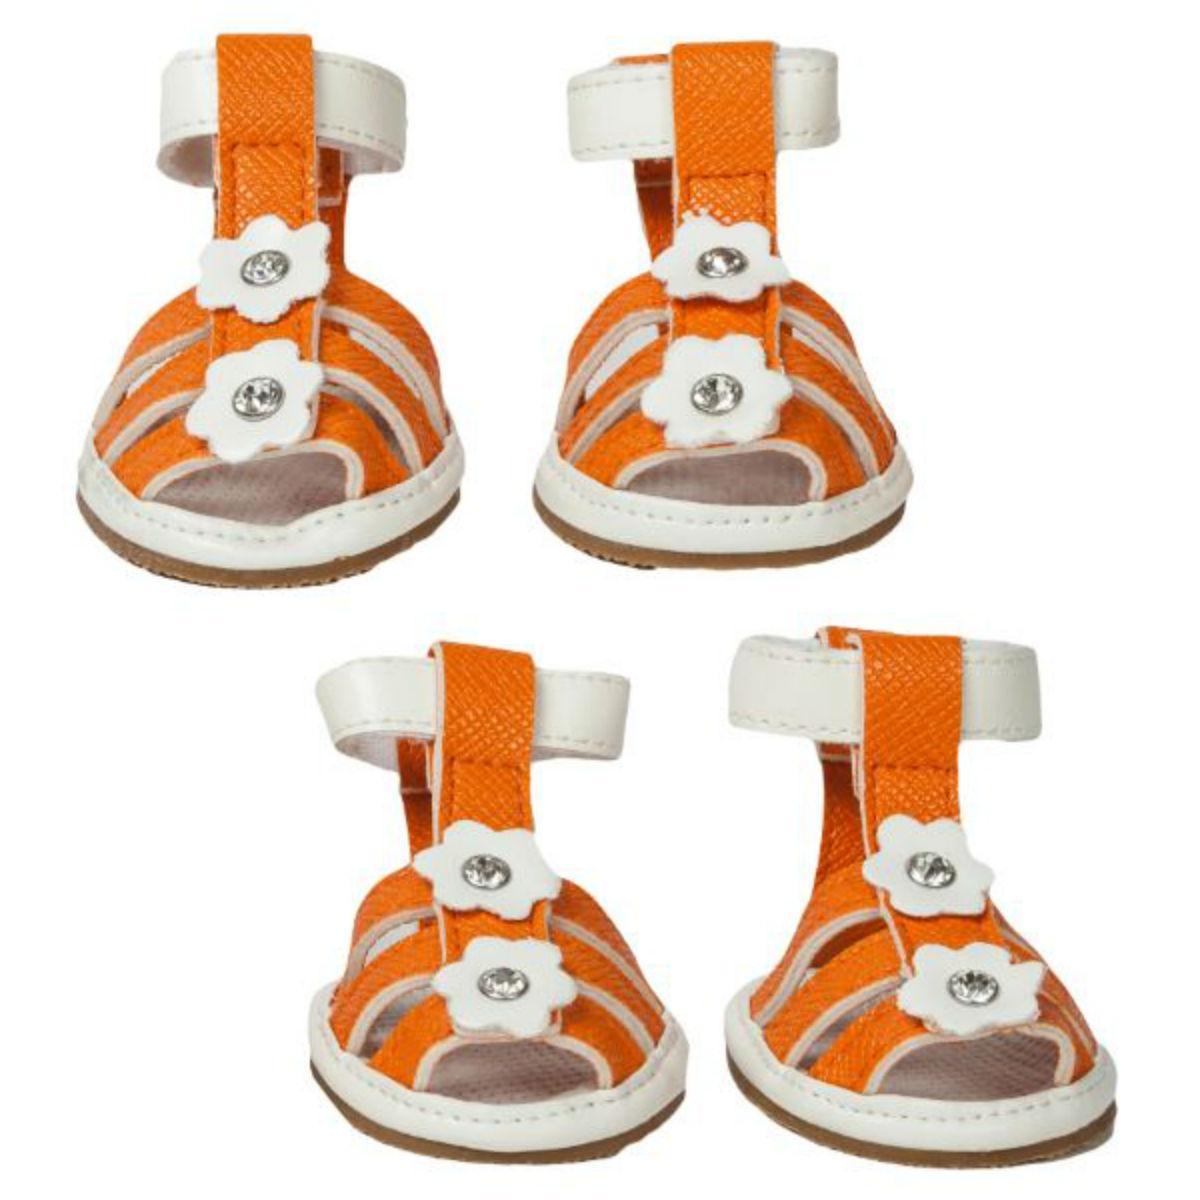 Pet Life Buckle-Supportive Pvc Waterproof Dog Sandals Shoes - Set Of 4 - Orange Floral